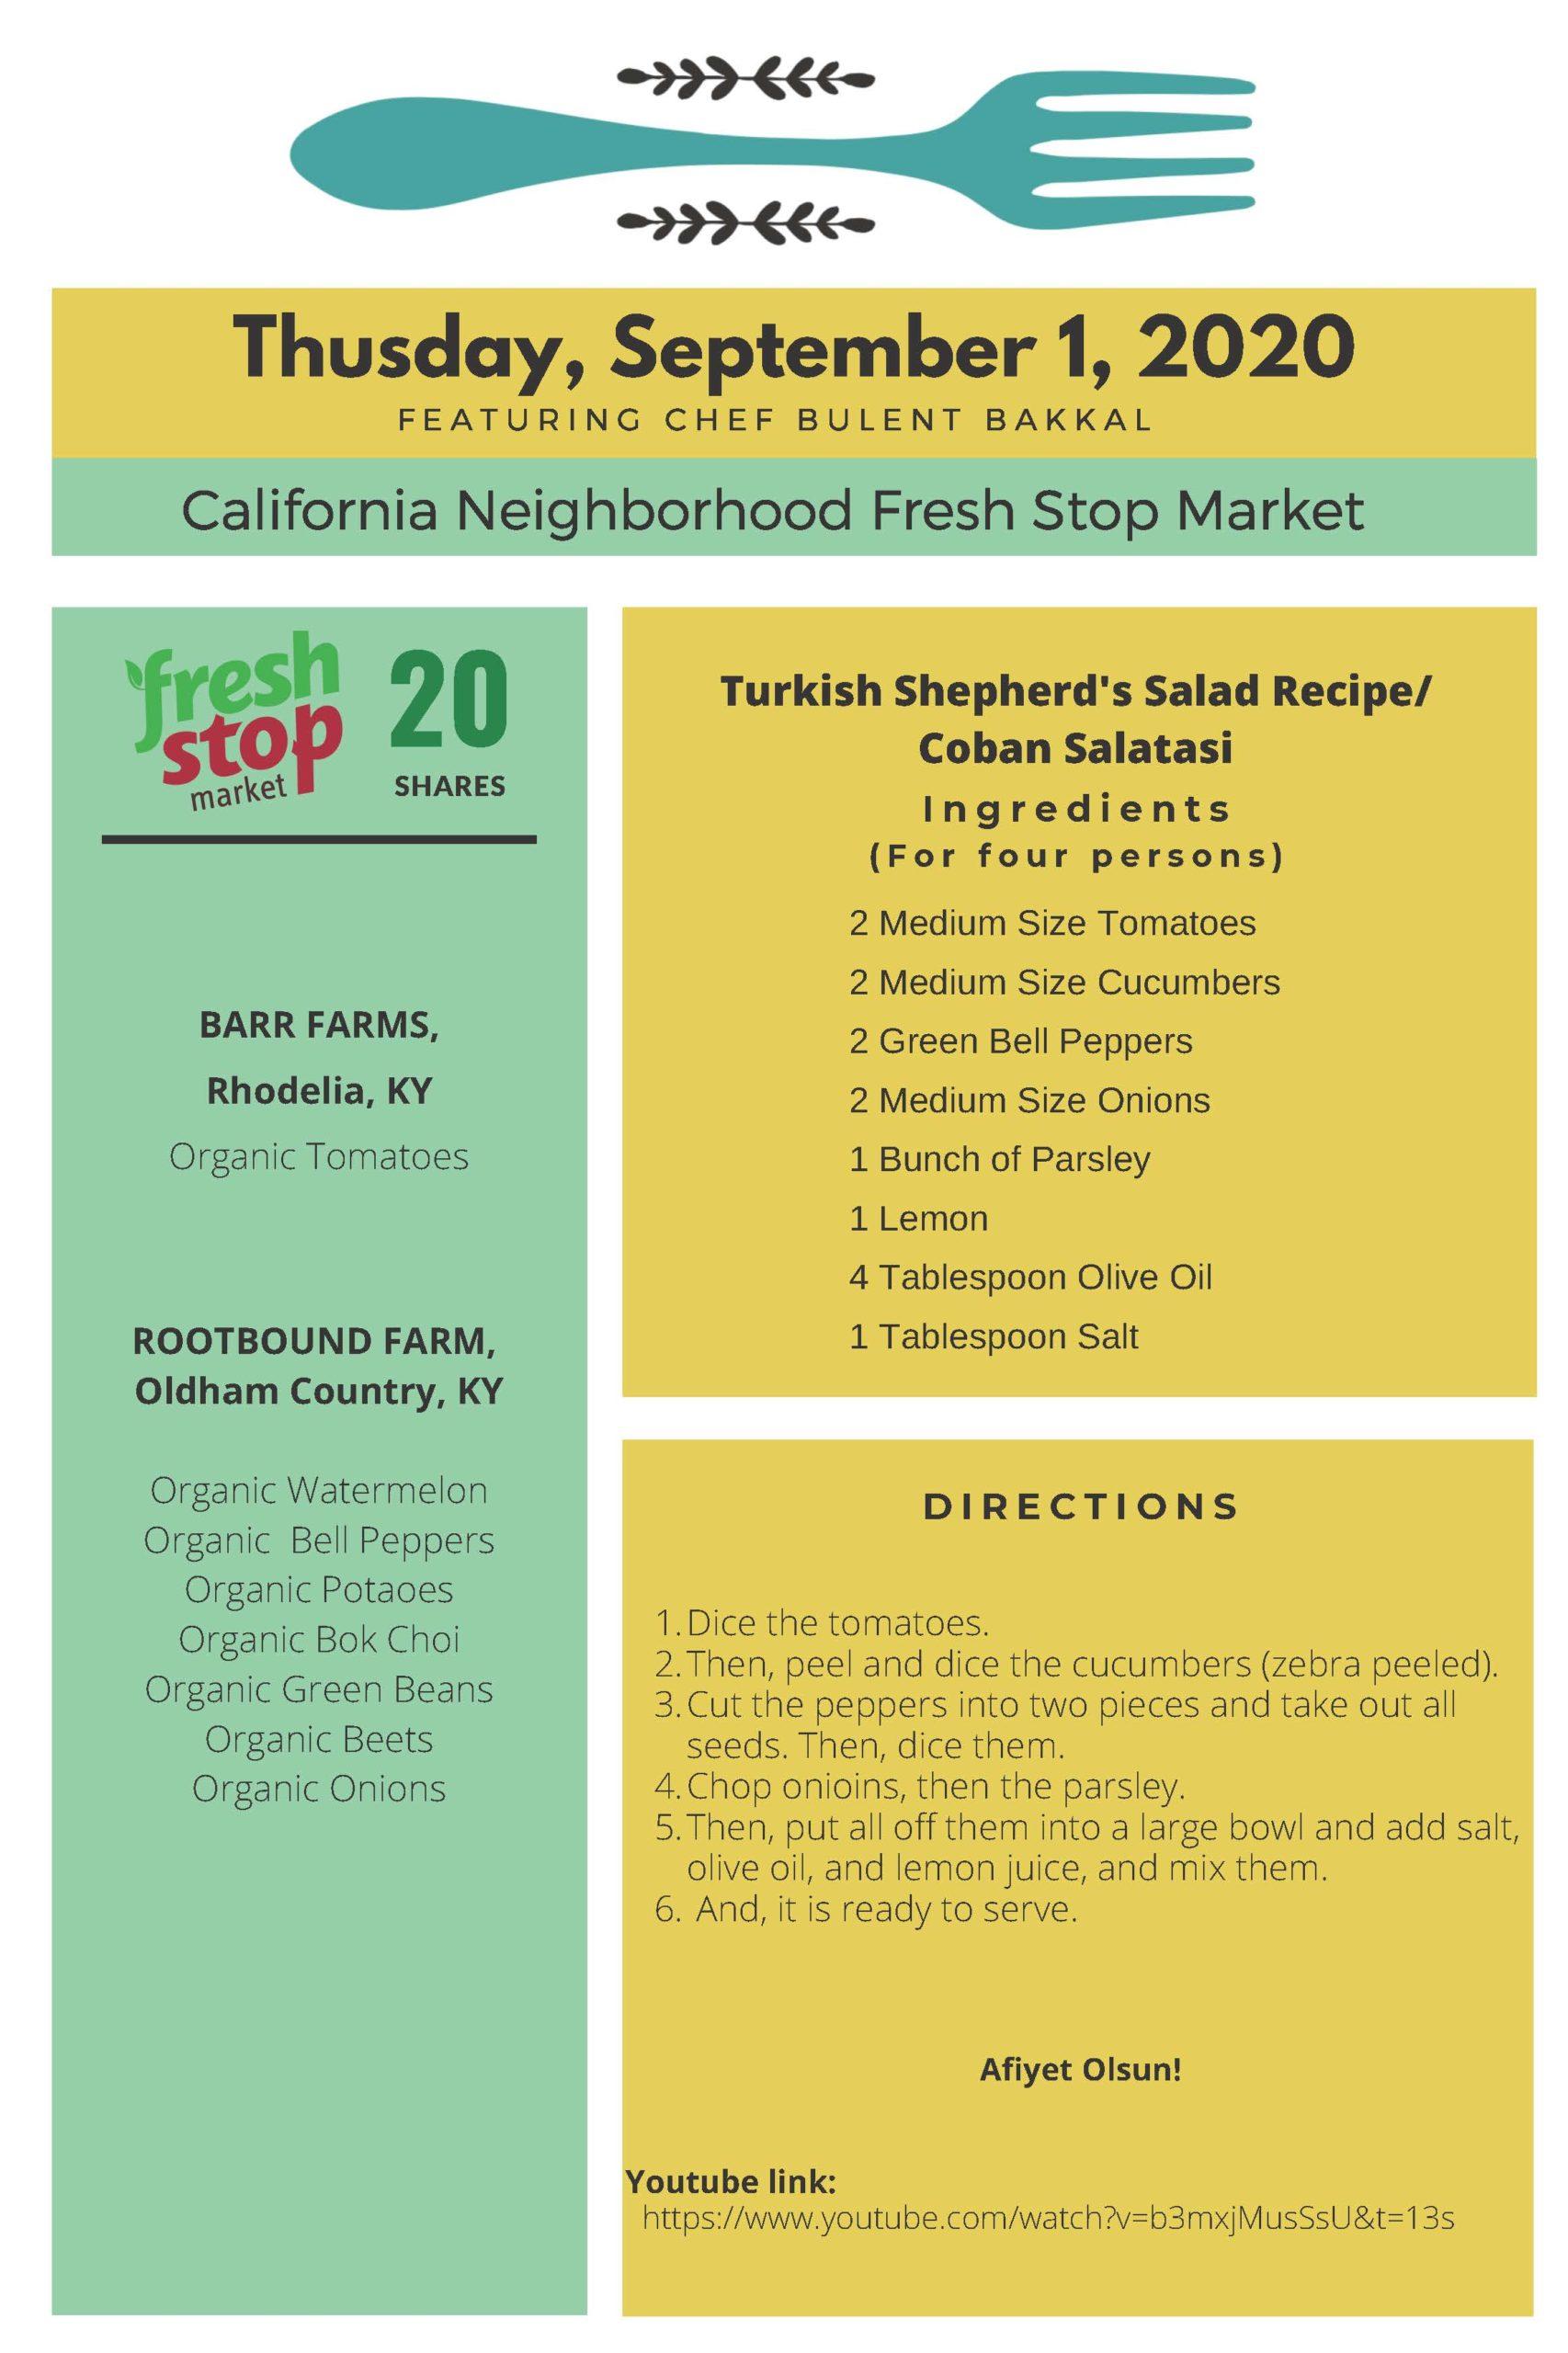 Fresh Stop Markets Food Recipes of 8/25-27/2020